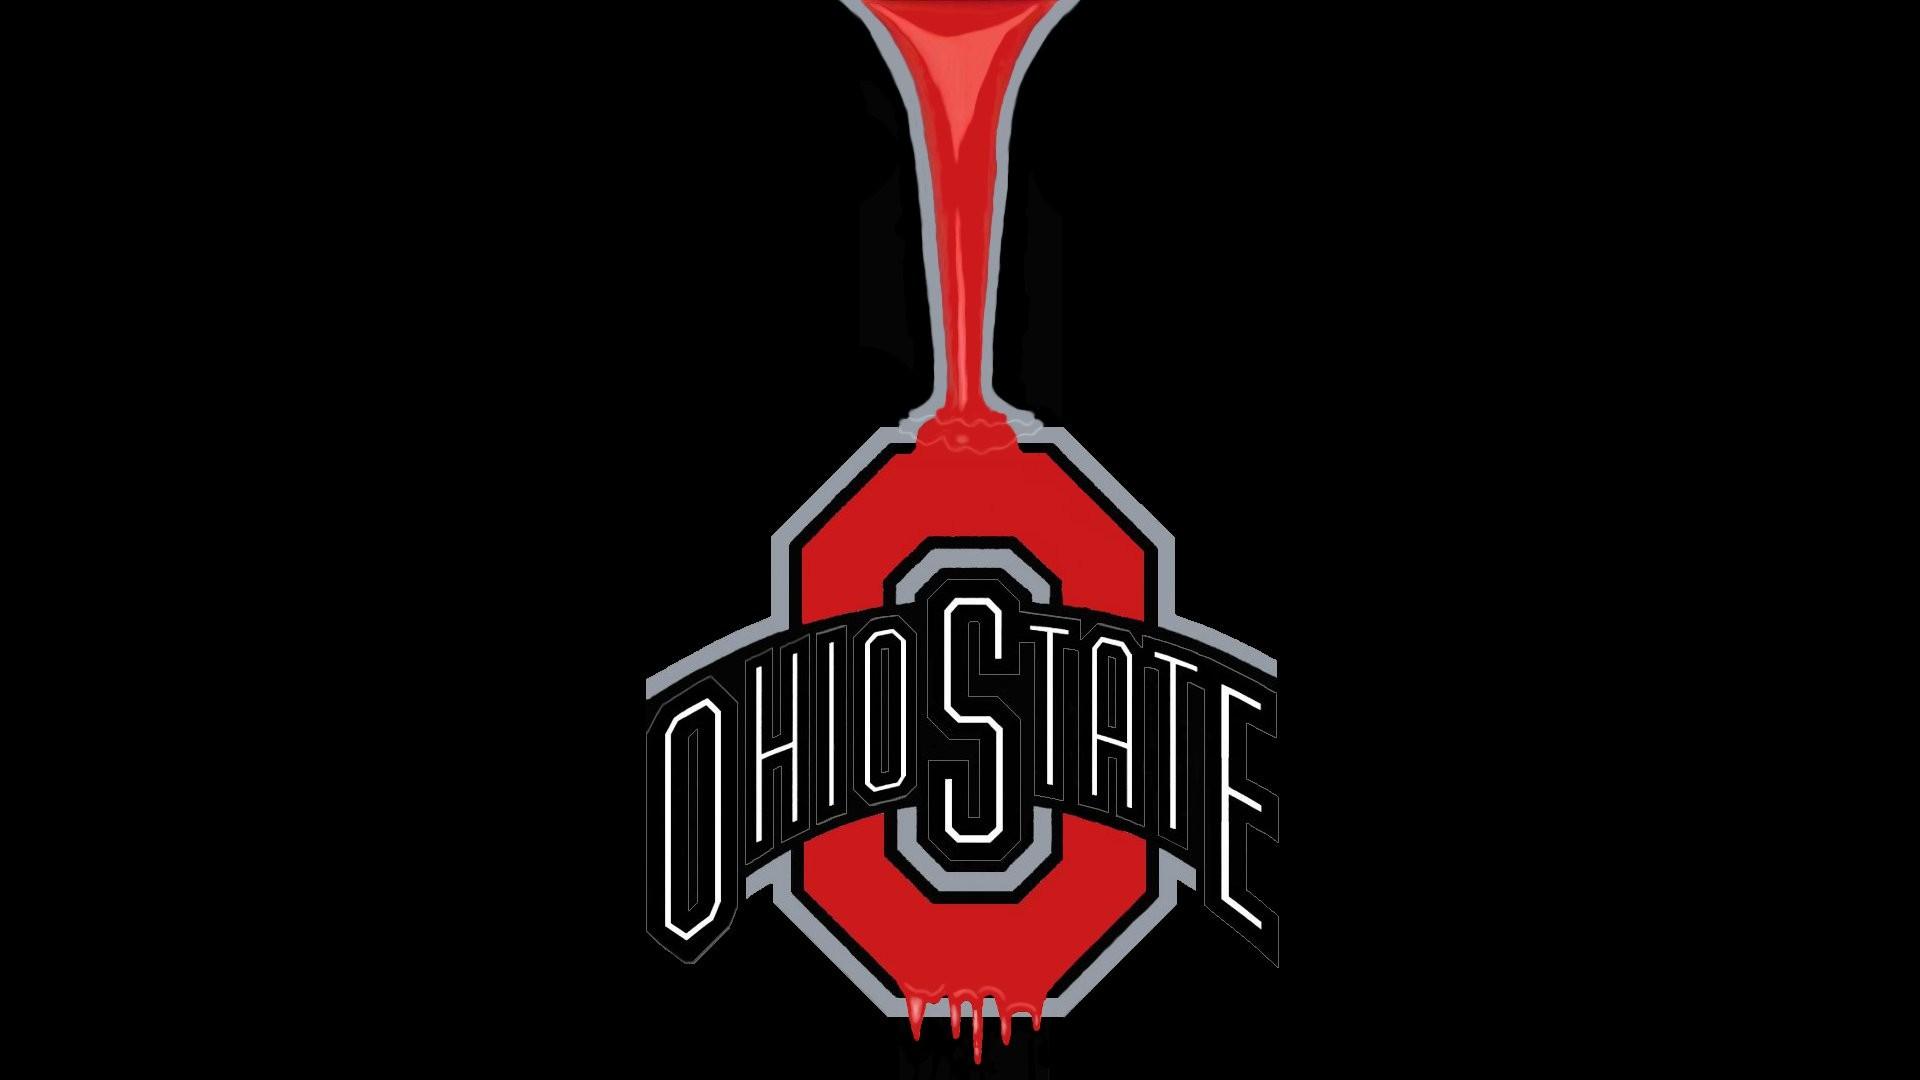 OSU Wallpaper 202 – Ohio State Football Wallpaper (29072199) – Fanpop